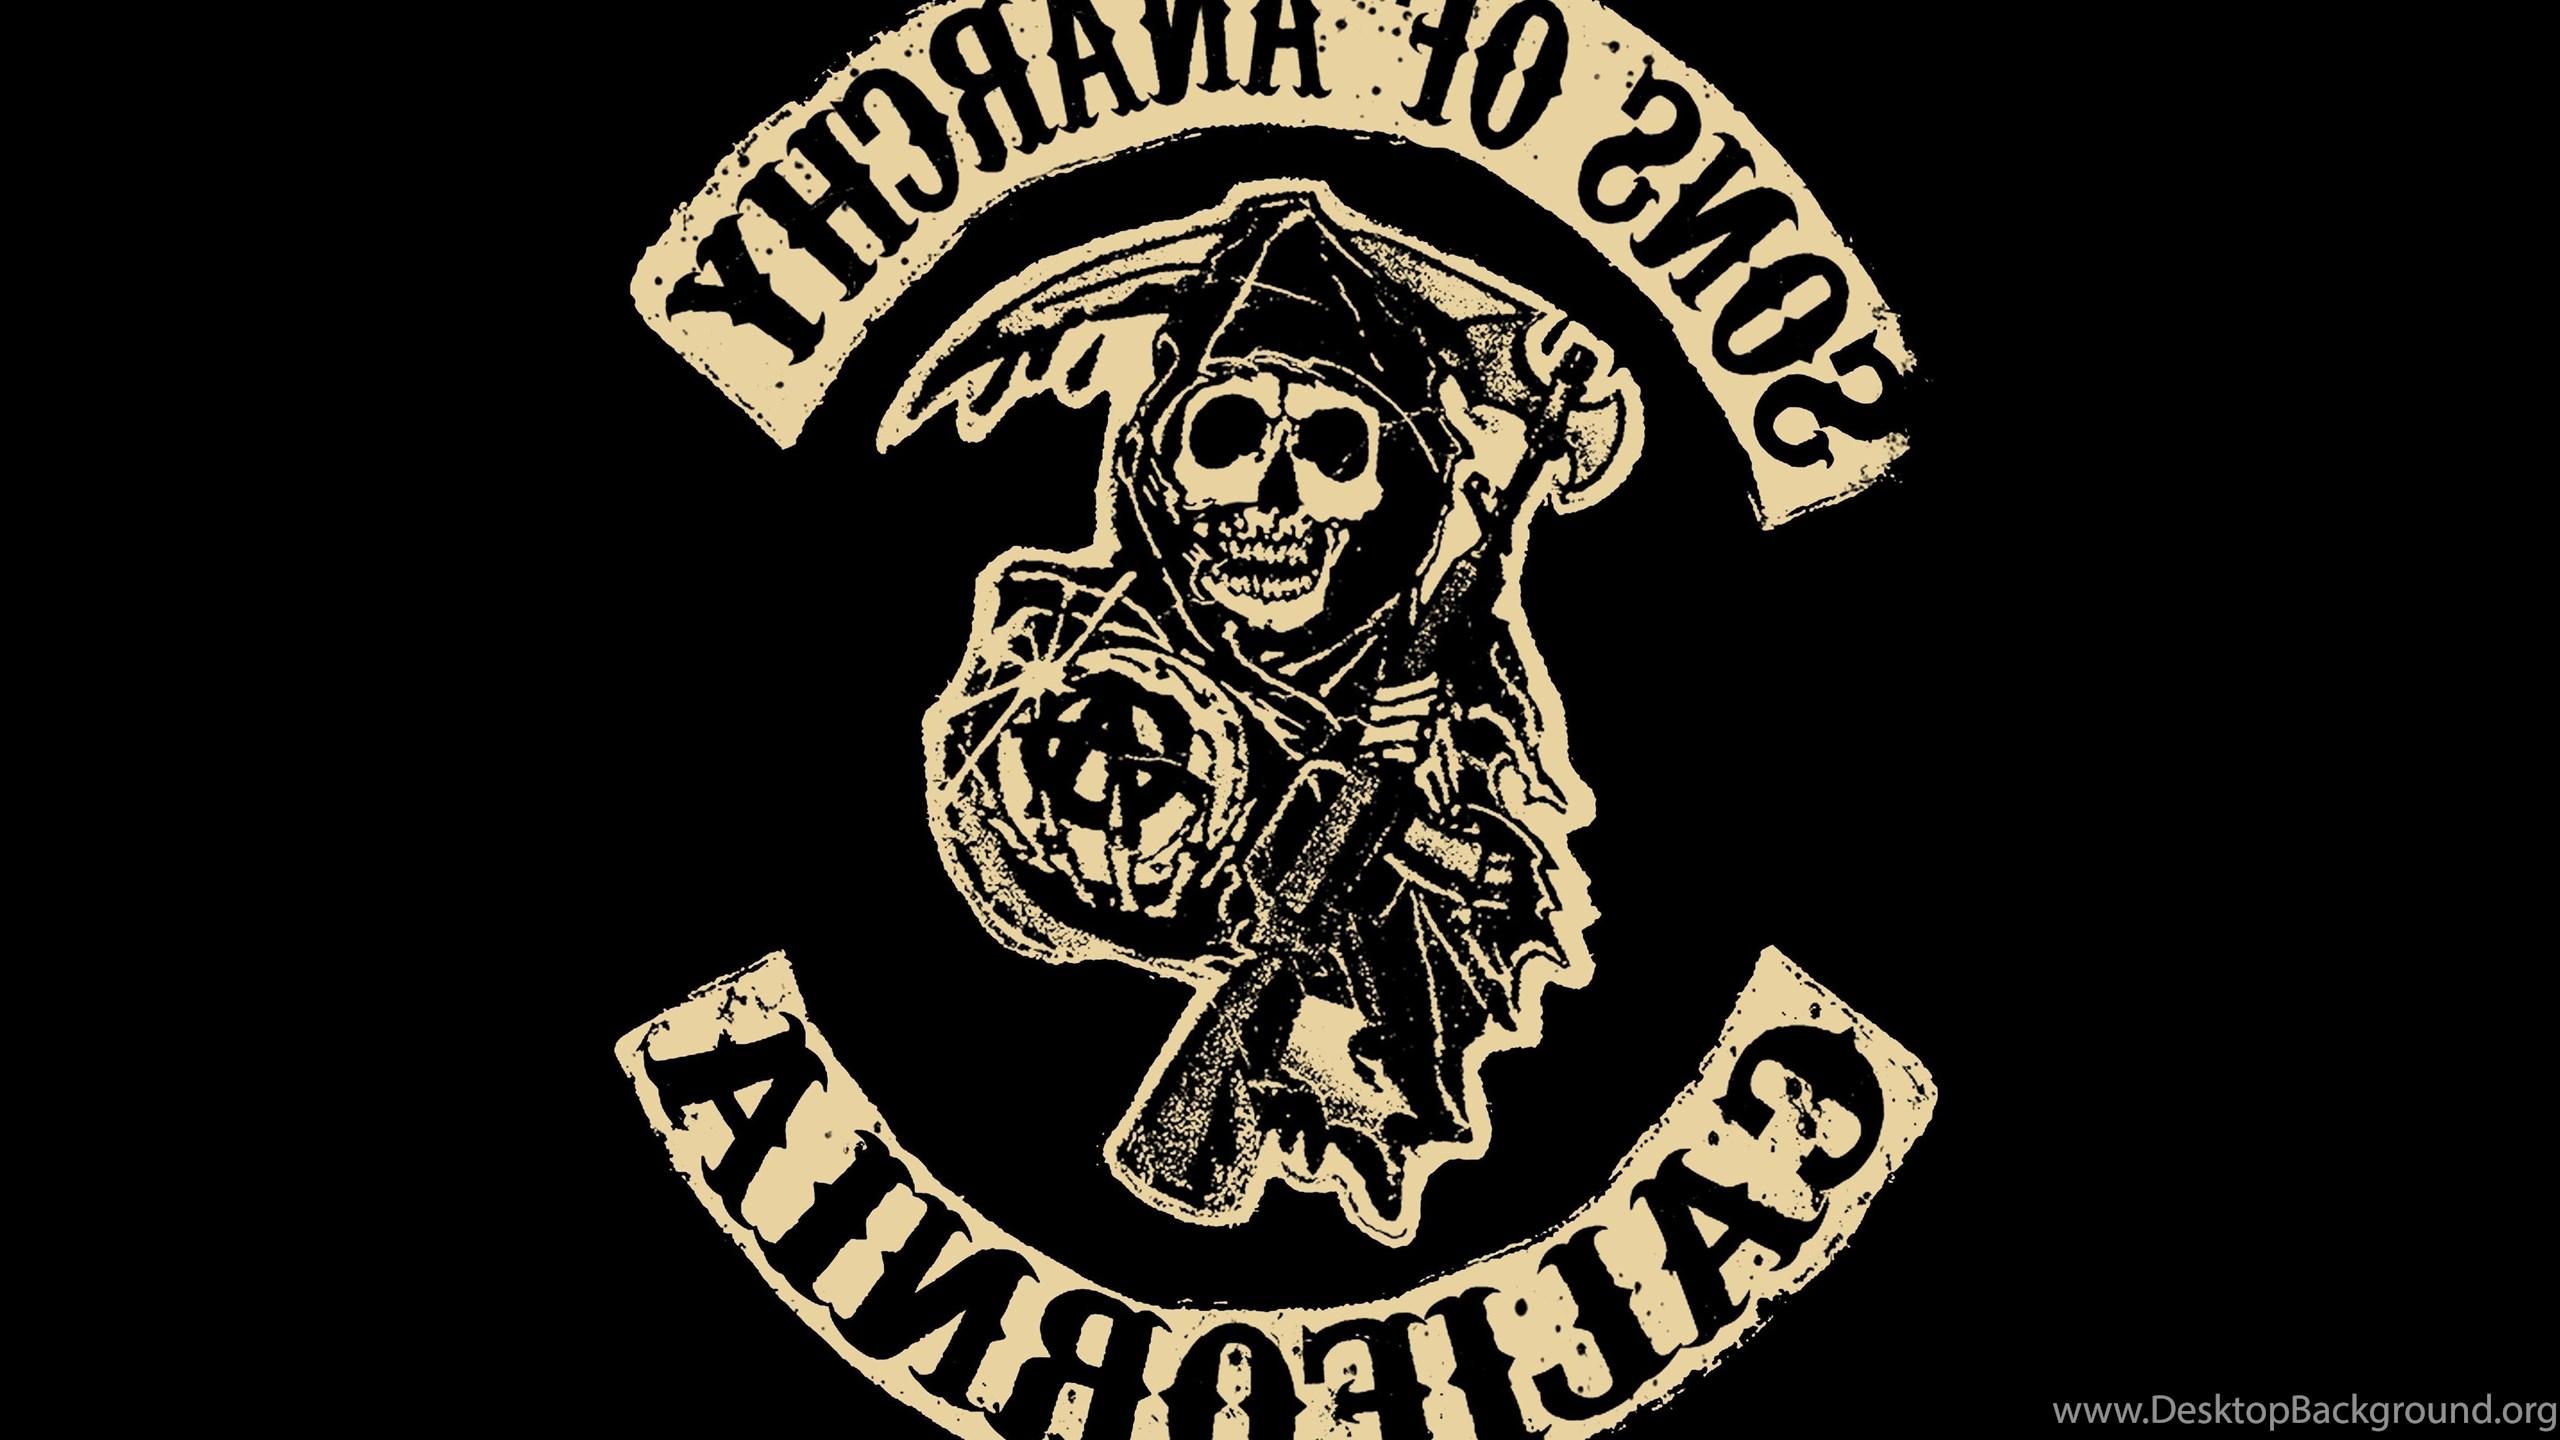 Sons Of Anarchy Tv Series Logo California Desktop Background